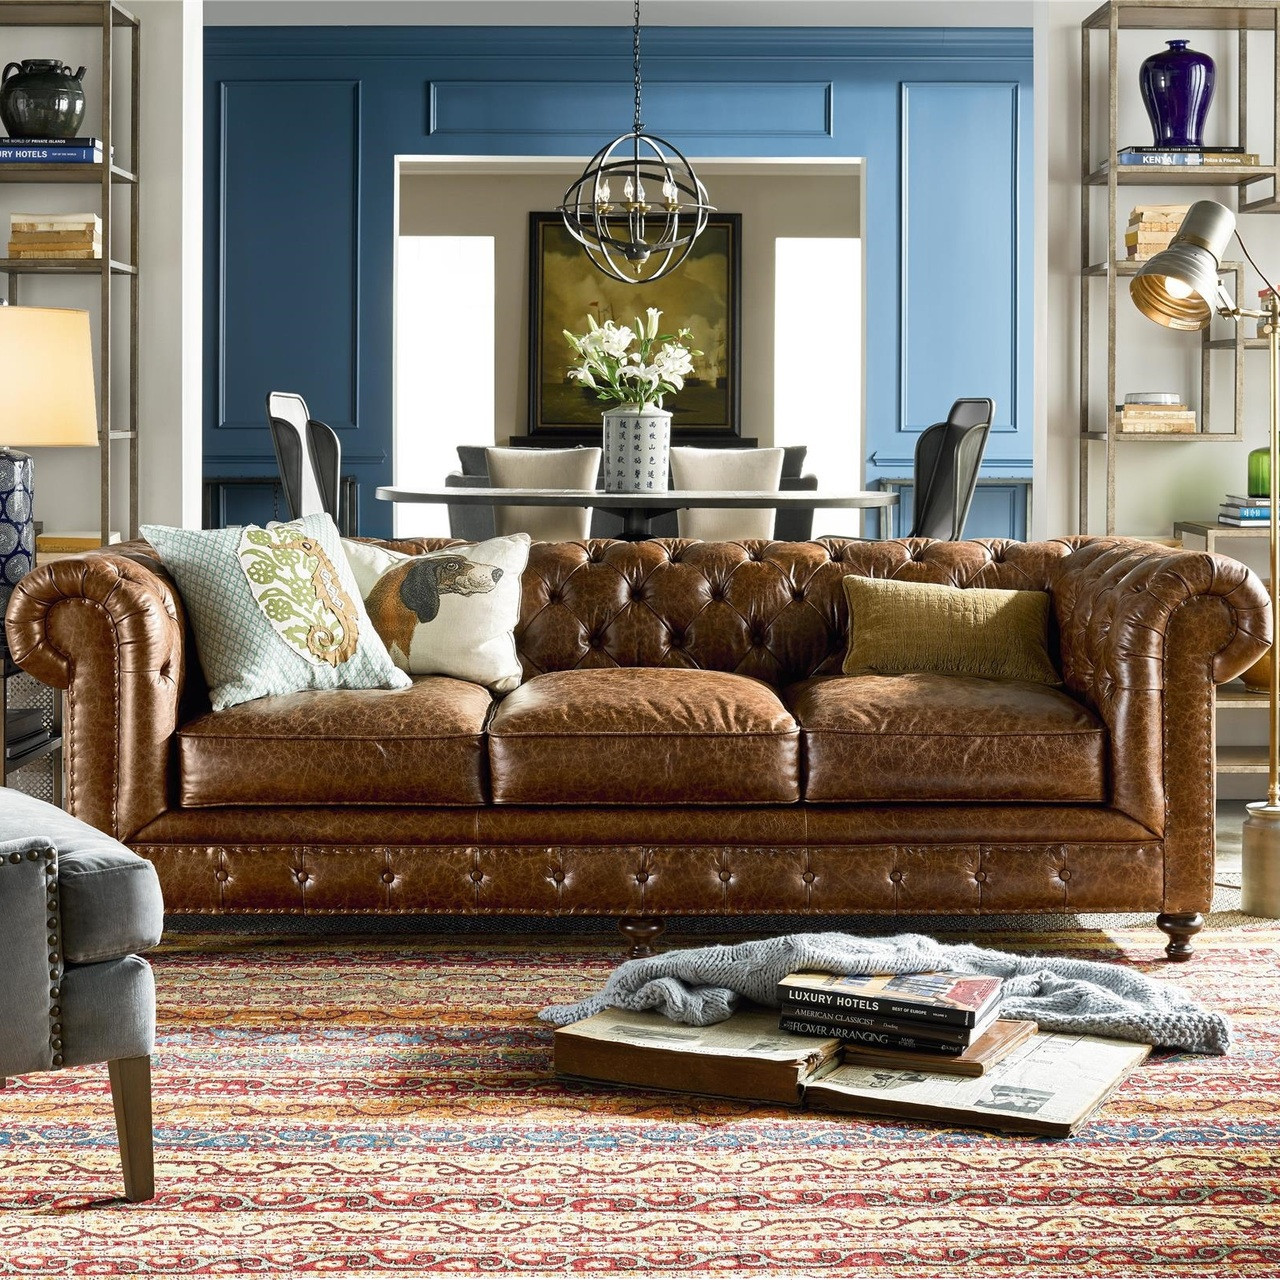 Belgian 3 Cushion Tufted Saddle Leather Chesterfield Sofa